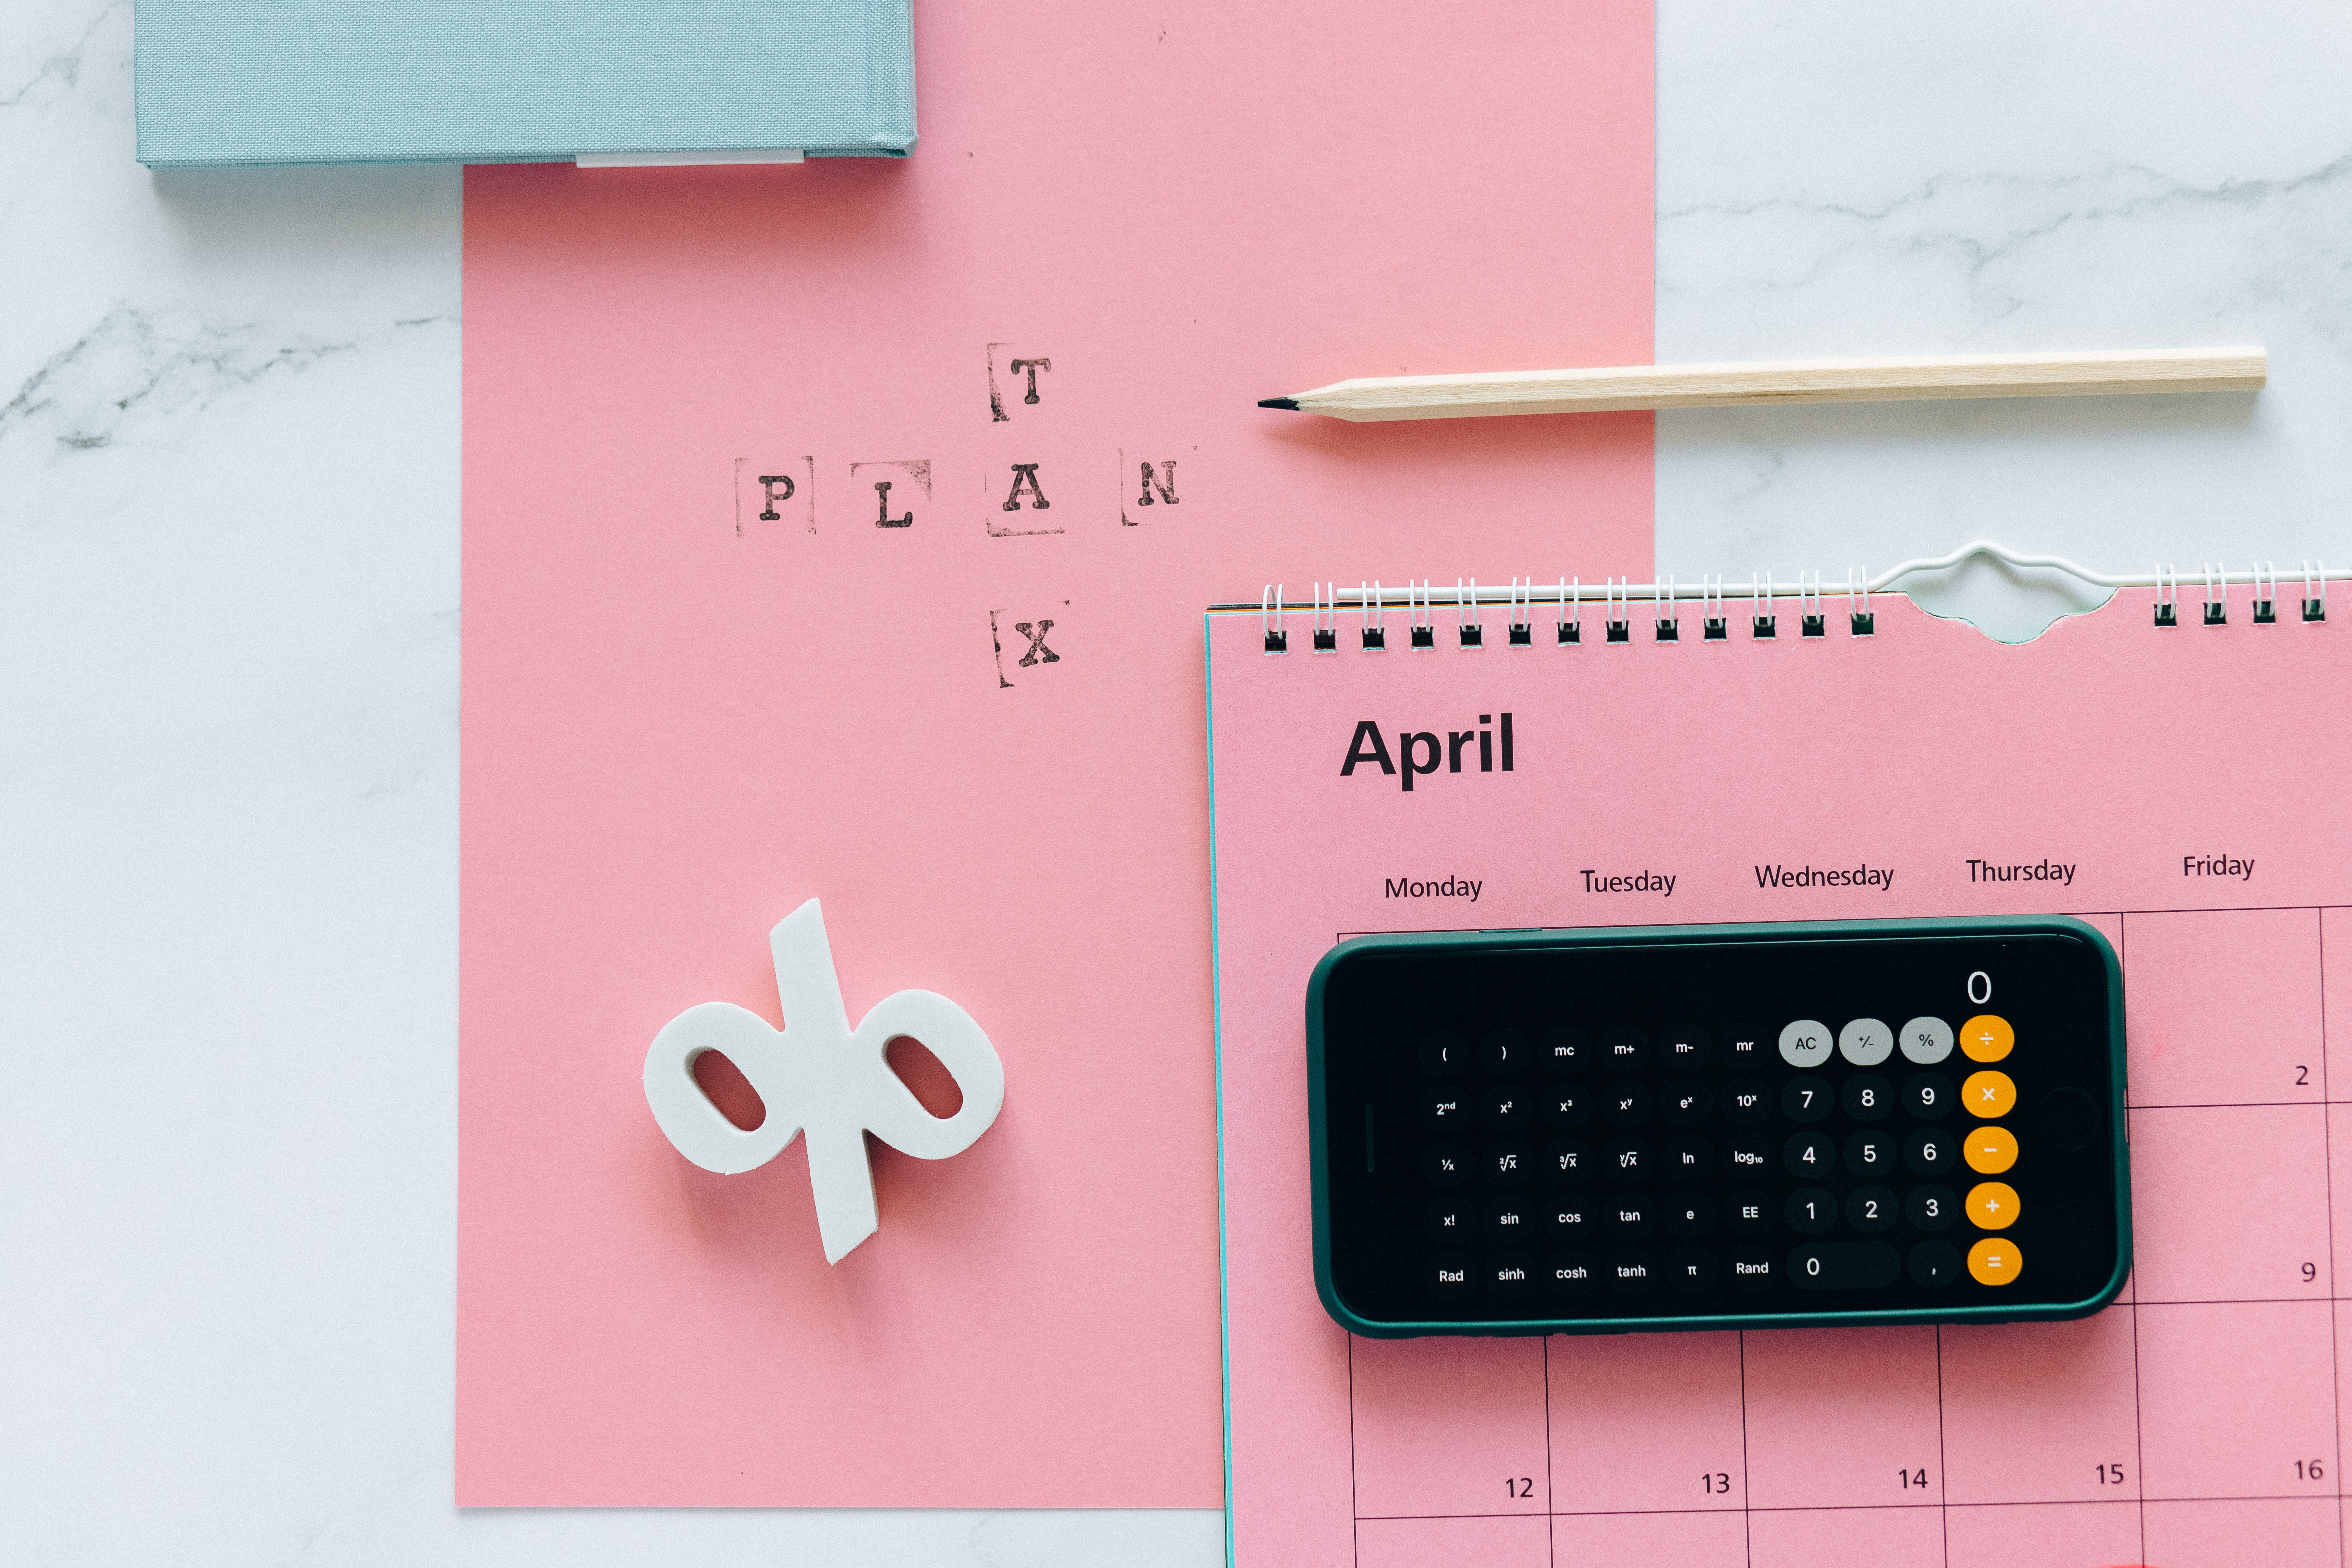 Professional Tax Preparation Business